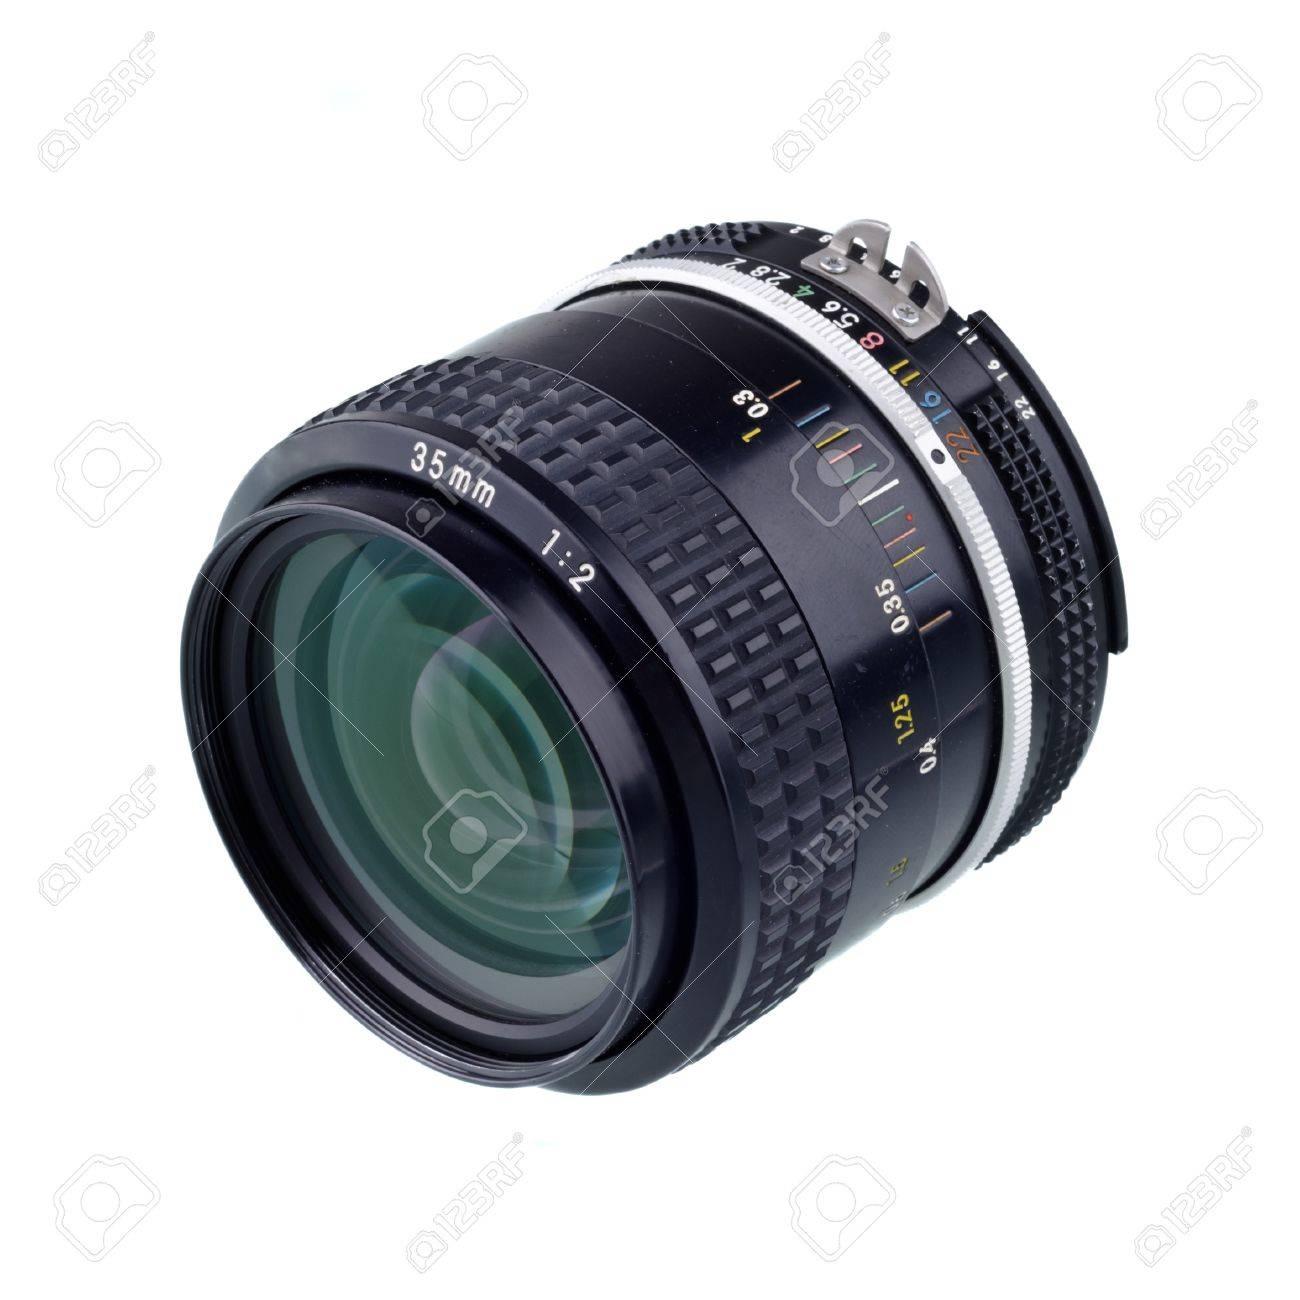 35 mm camera lense isolated on white Stock Photo - 9137999